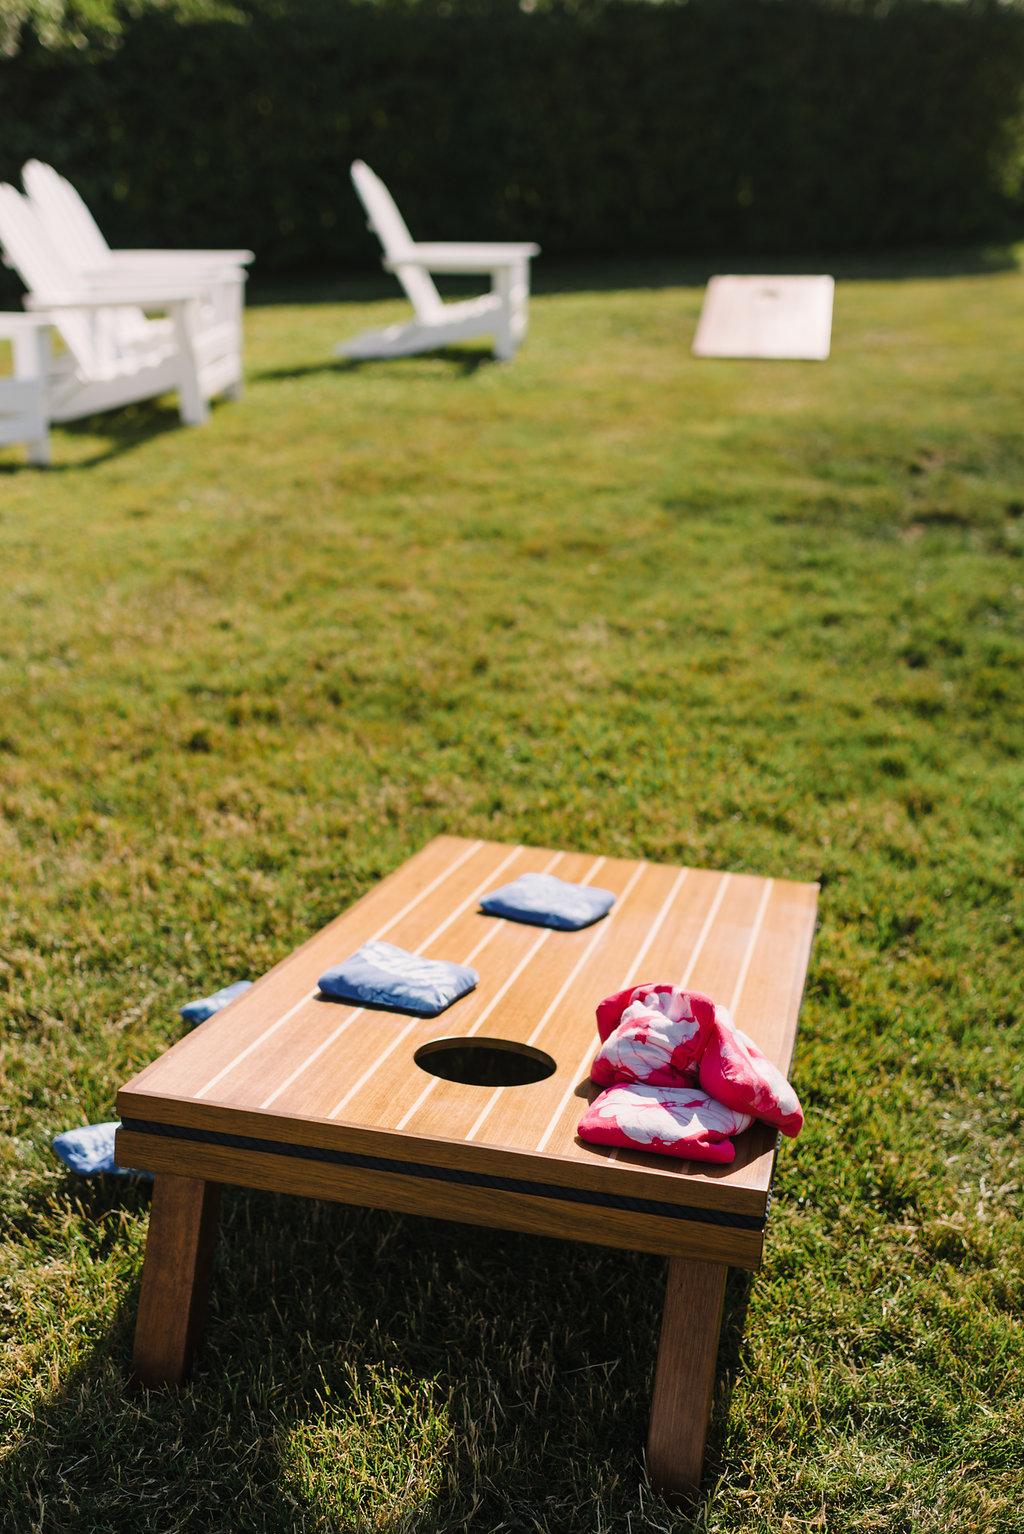 Cameron-Powel-Wes-Mize-wedding-20160618-431.jpg